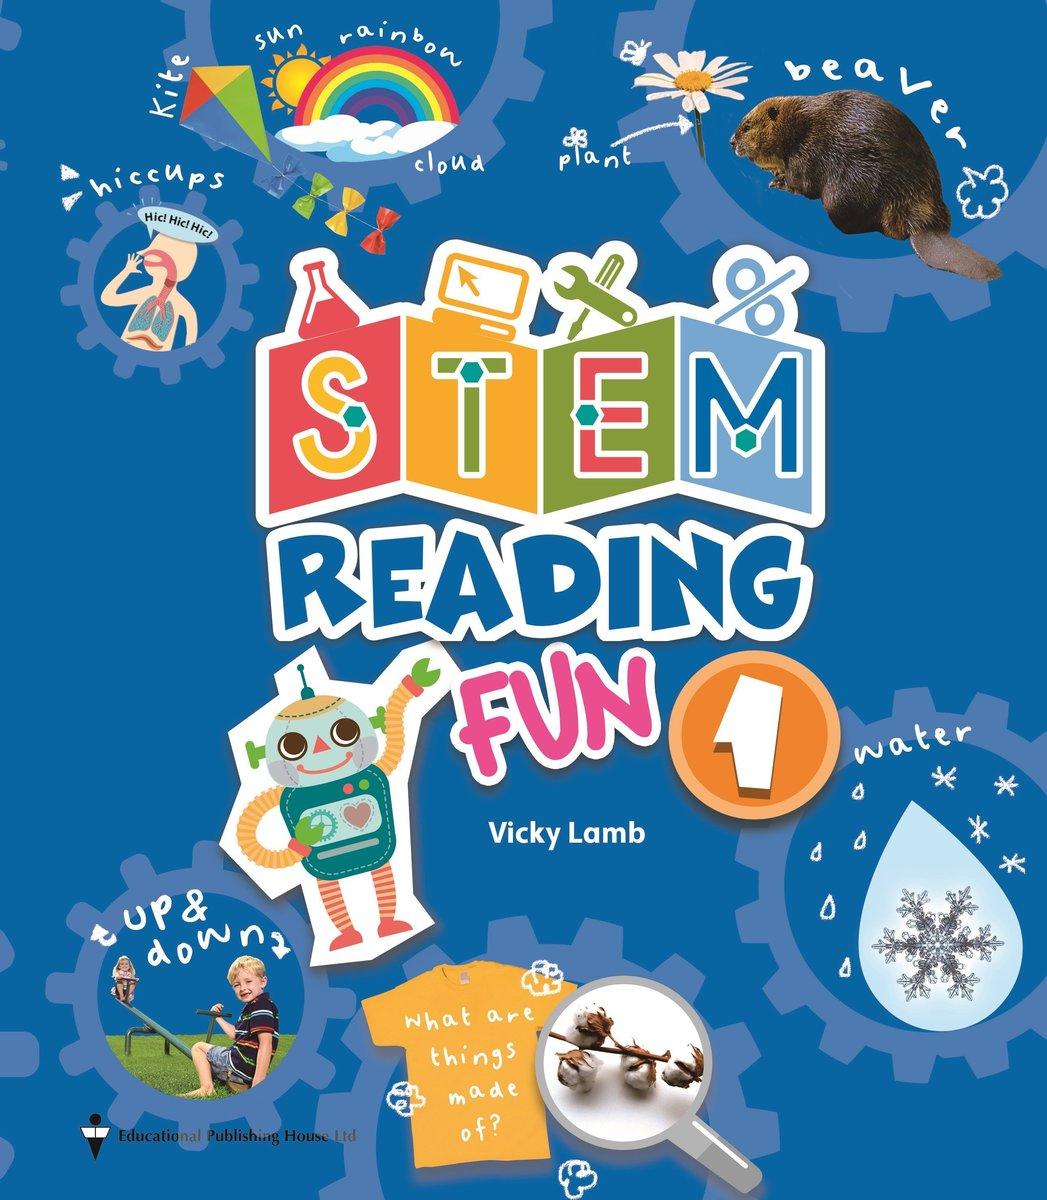 STEM Reading Fun Book 1